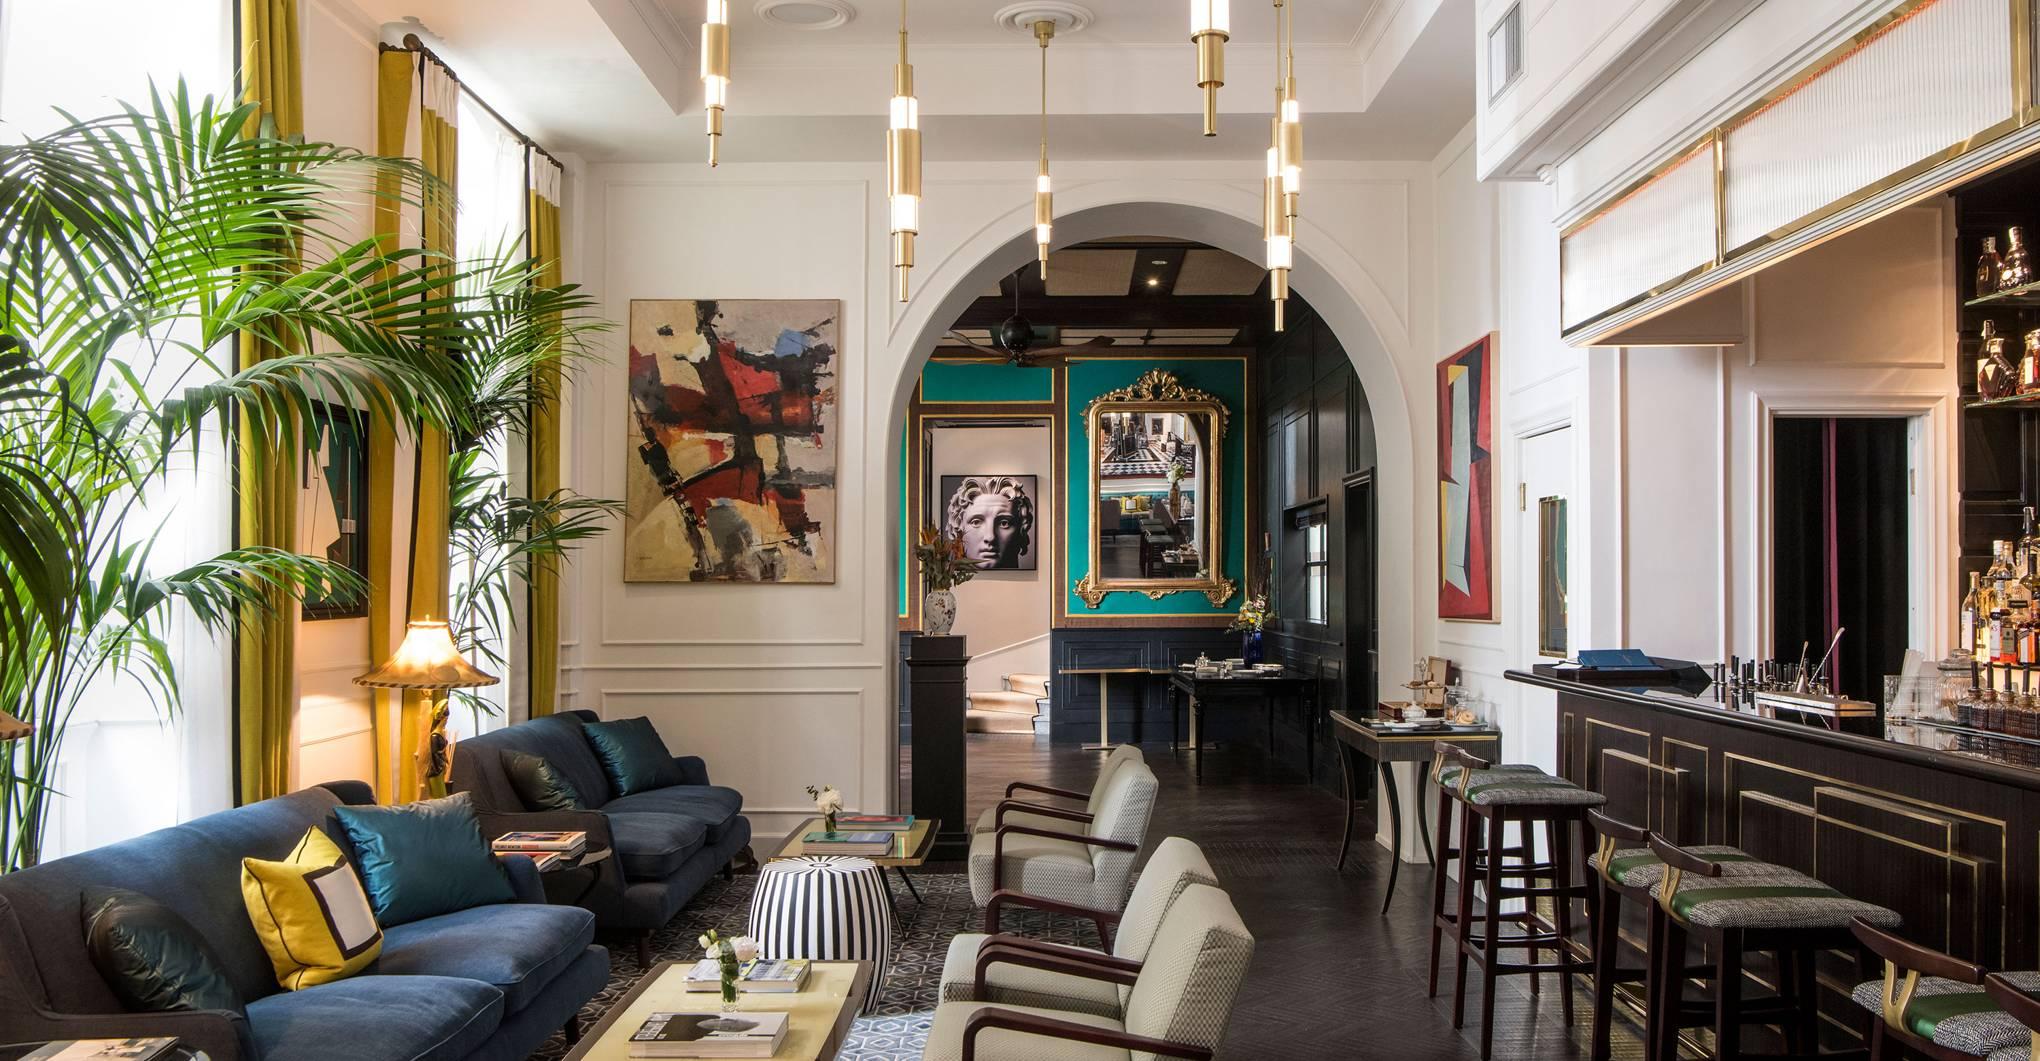 Hotel Vilòn, Rome review